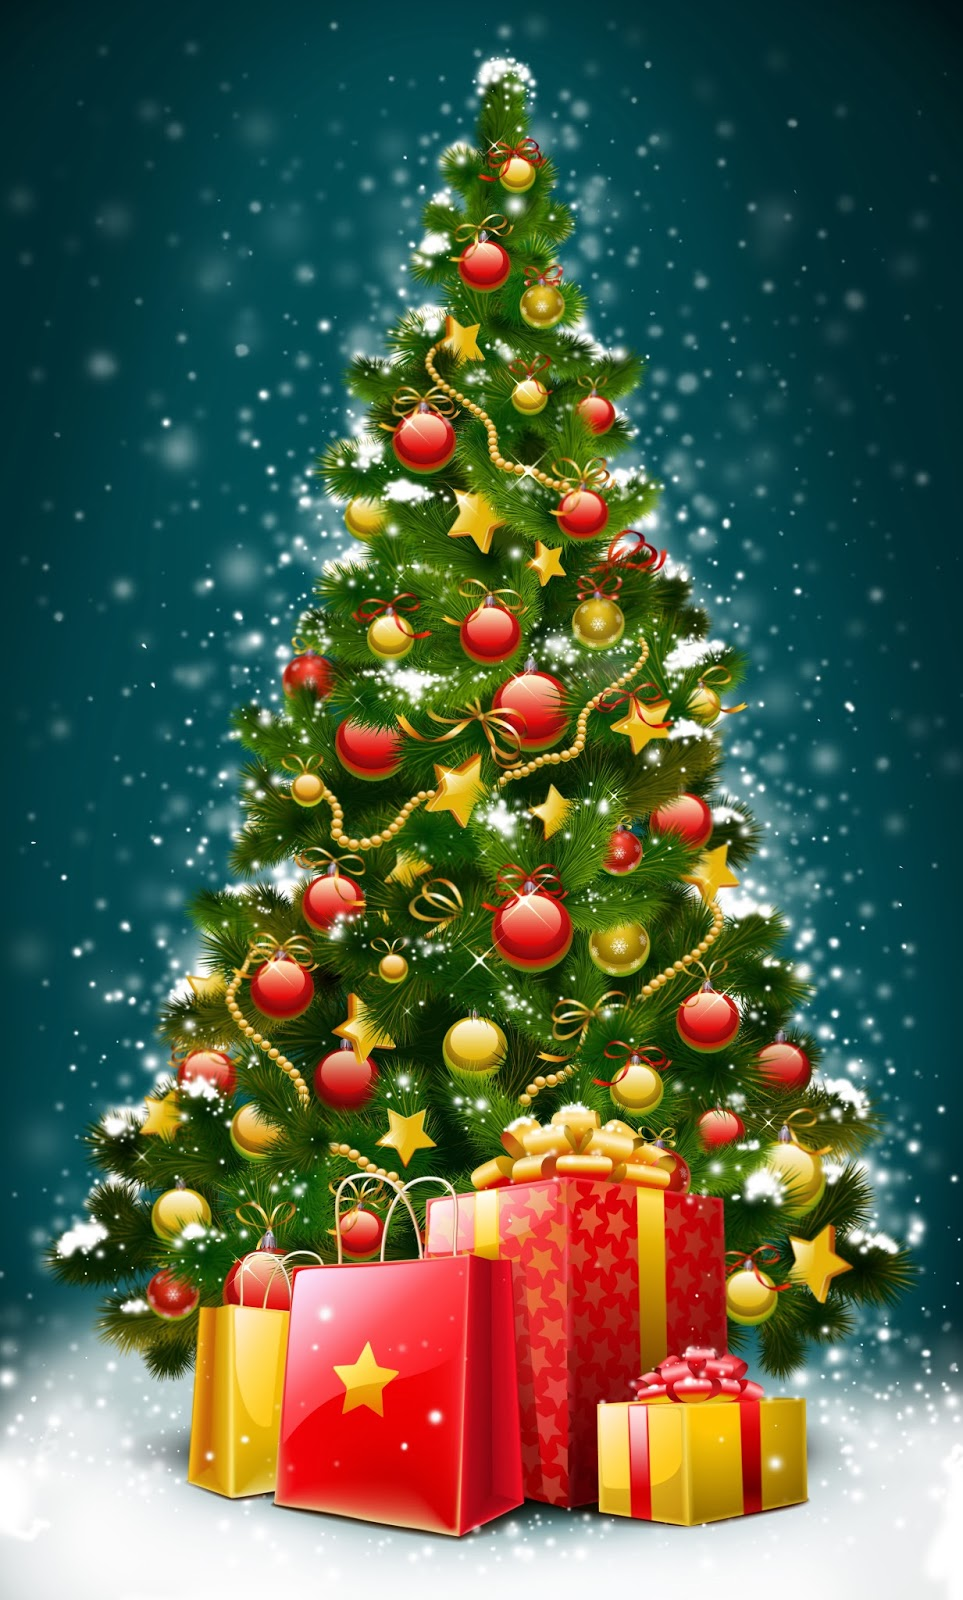 Christmas Trees Christmas Tree Decorations Happy